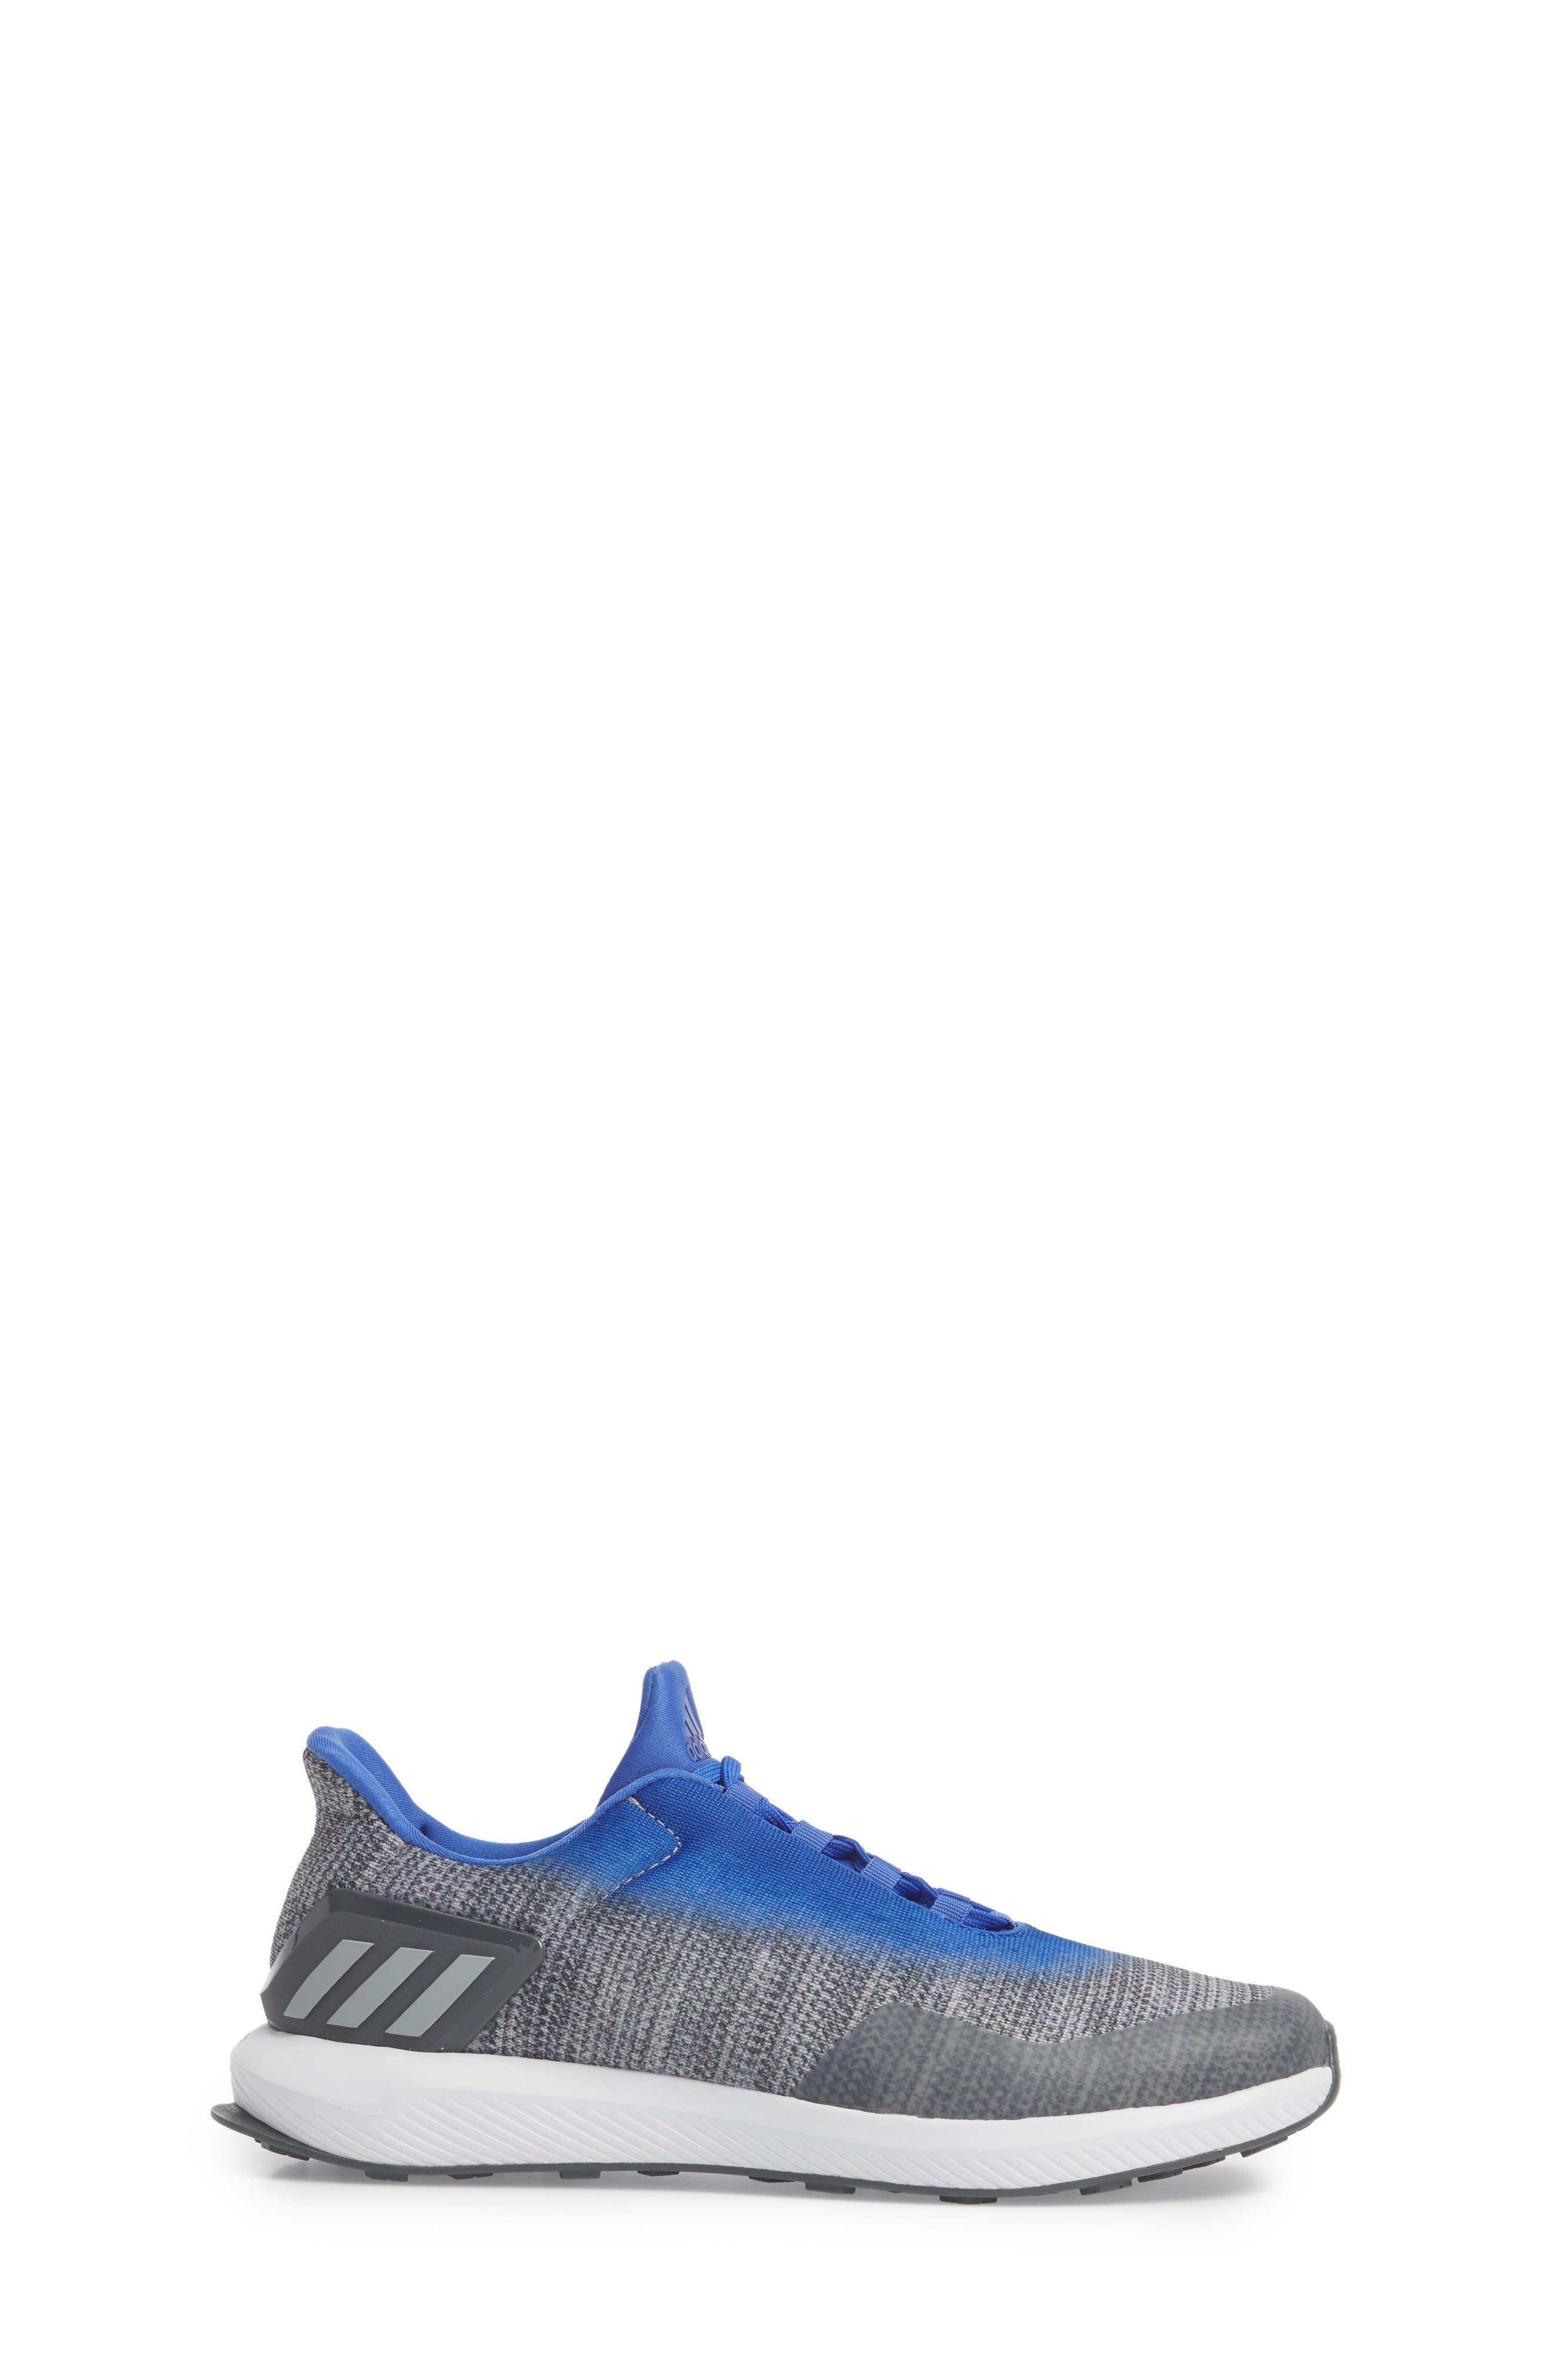 RapidaRun Uncaged Sneaker,                             Alternate thumbnail 3, color,                             Grey / Grey / Blue